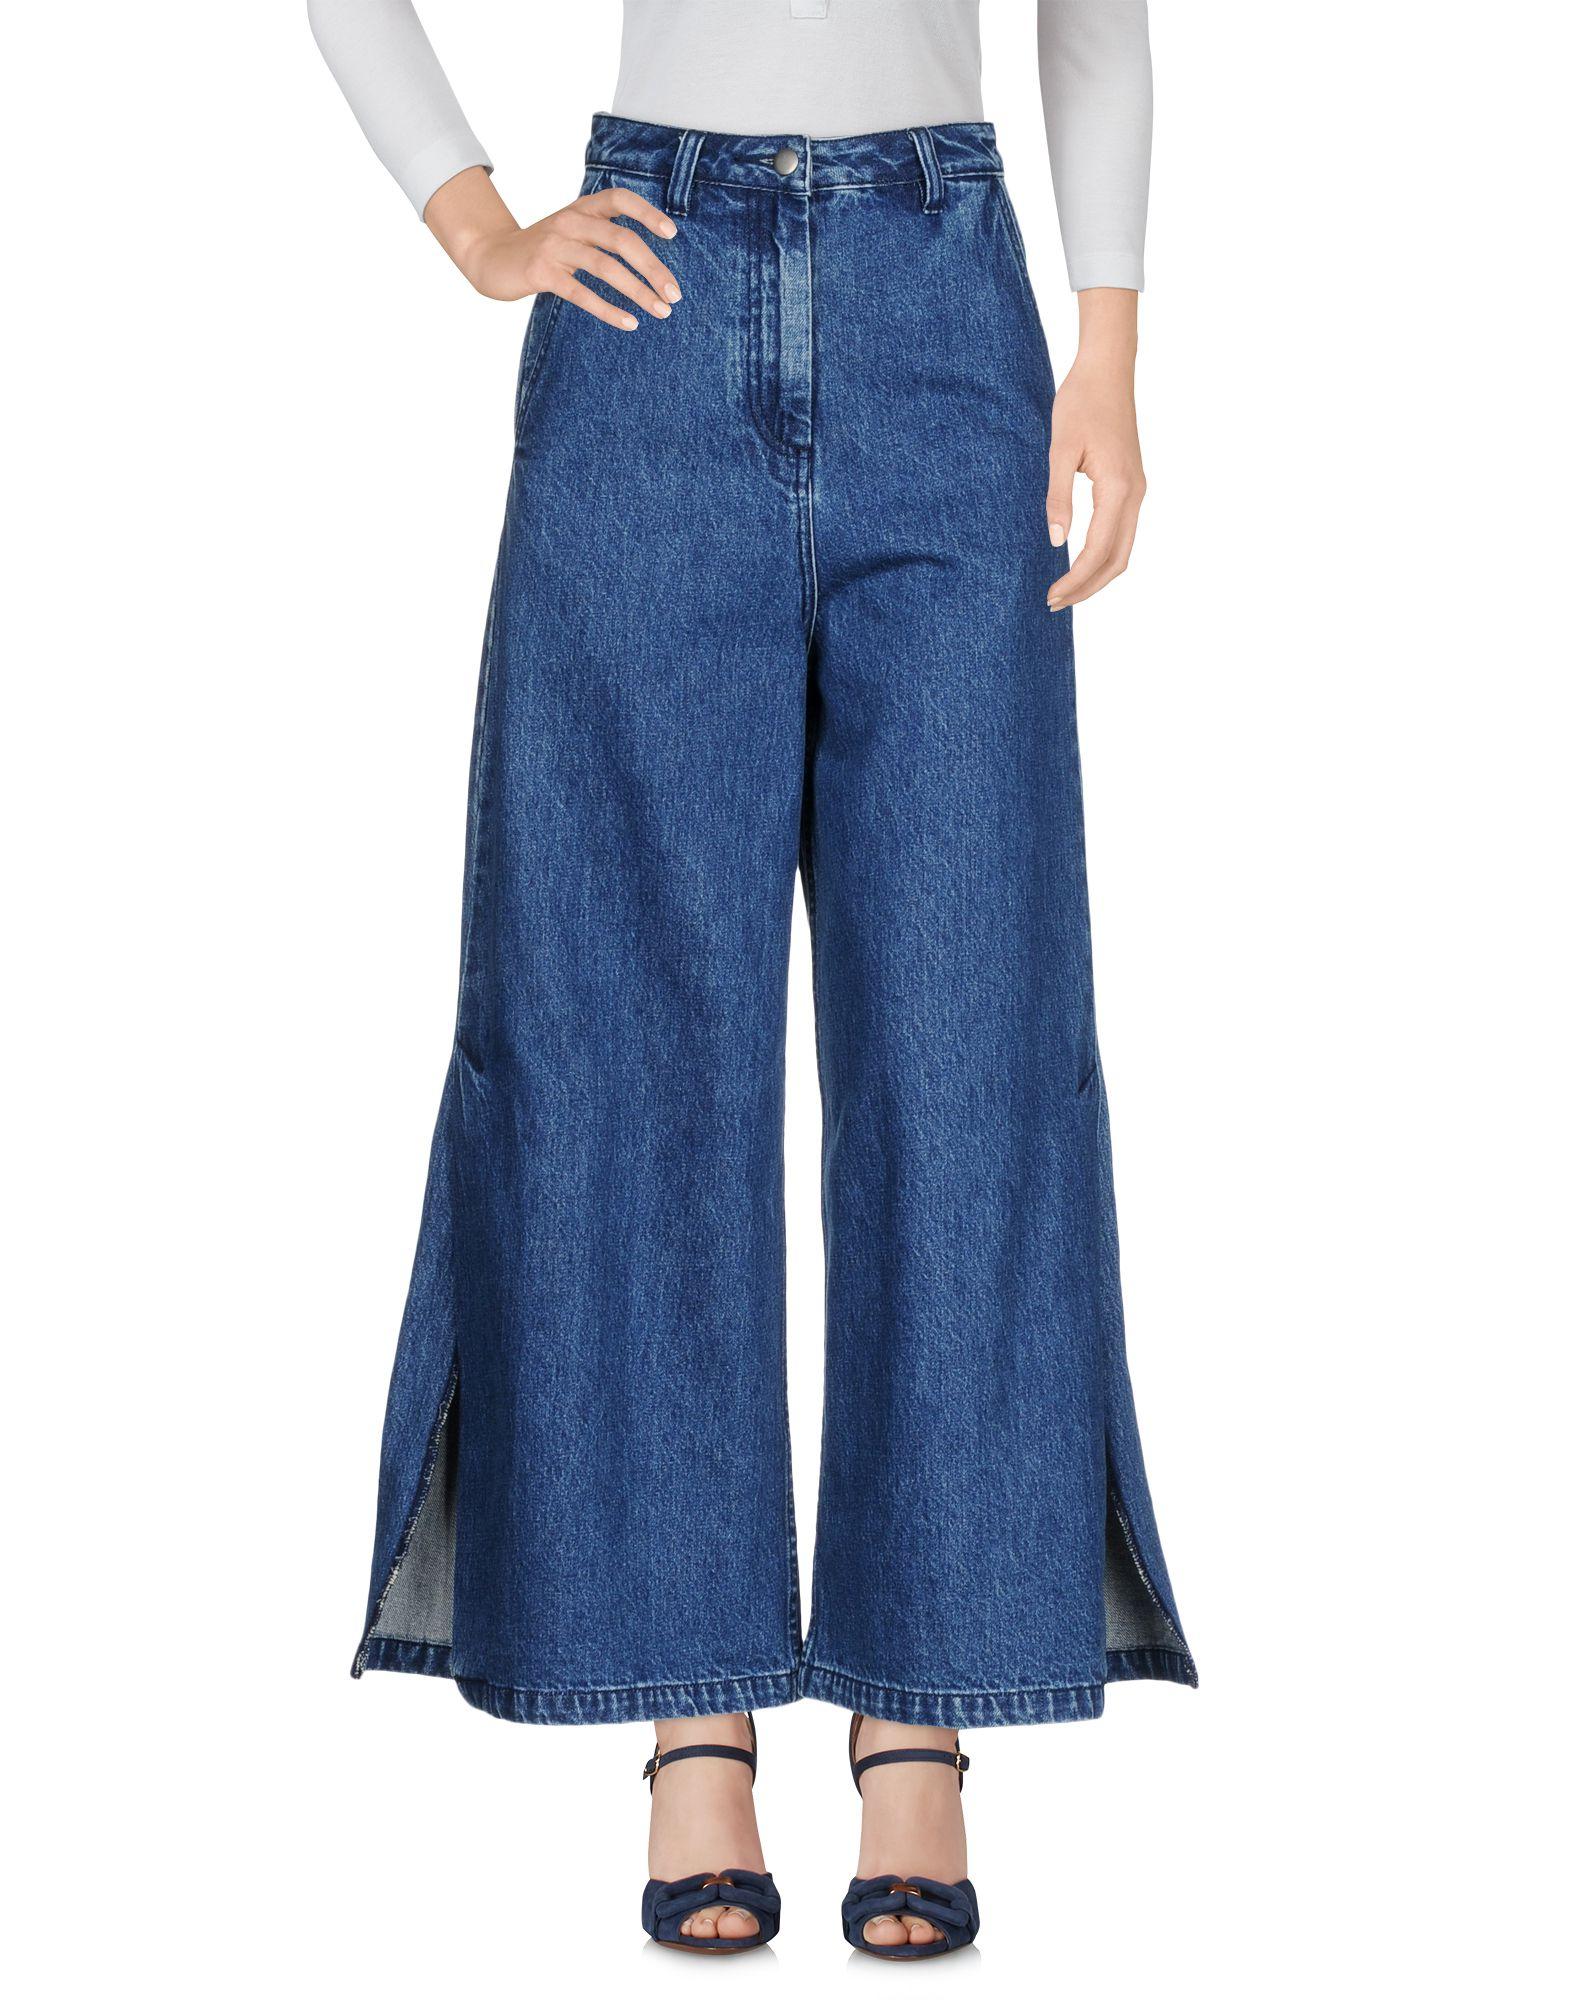 EDIT Denim Pants in Blue